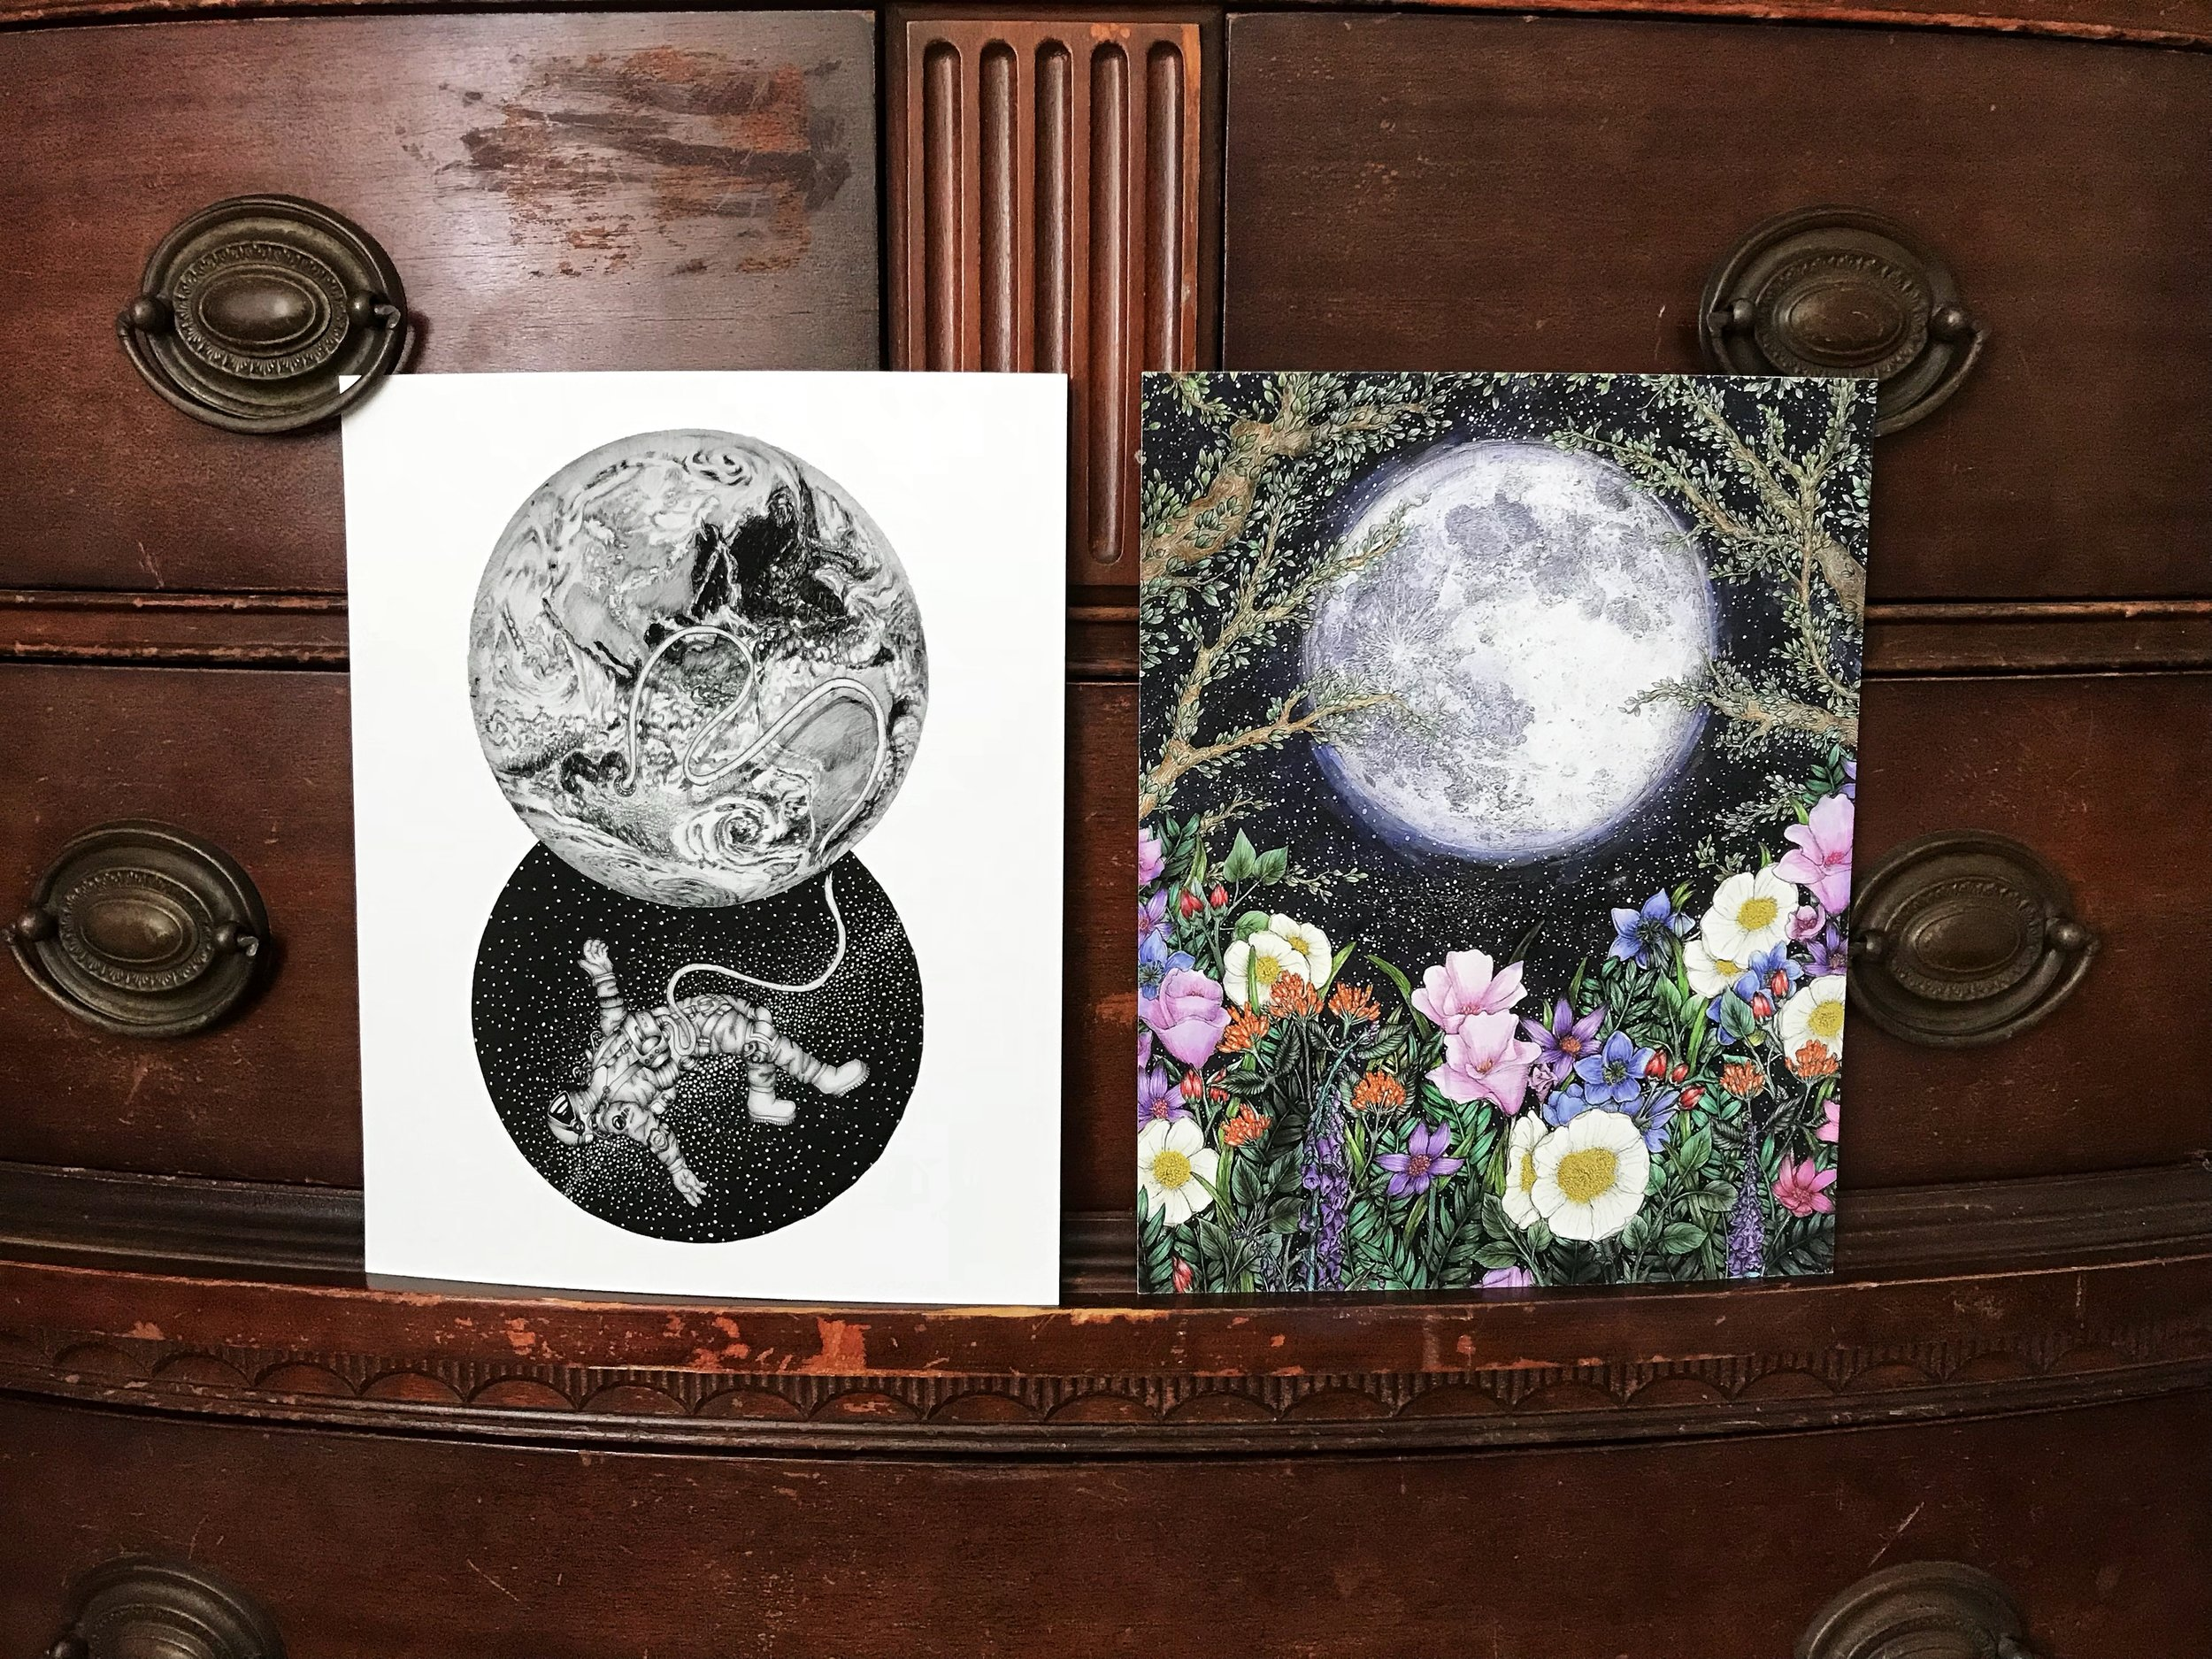 Fine Art Prints by ECMazur. Available in my shop!